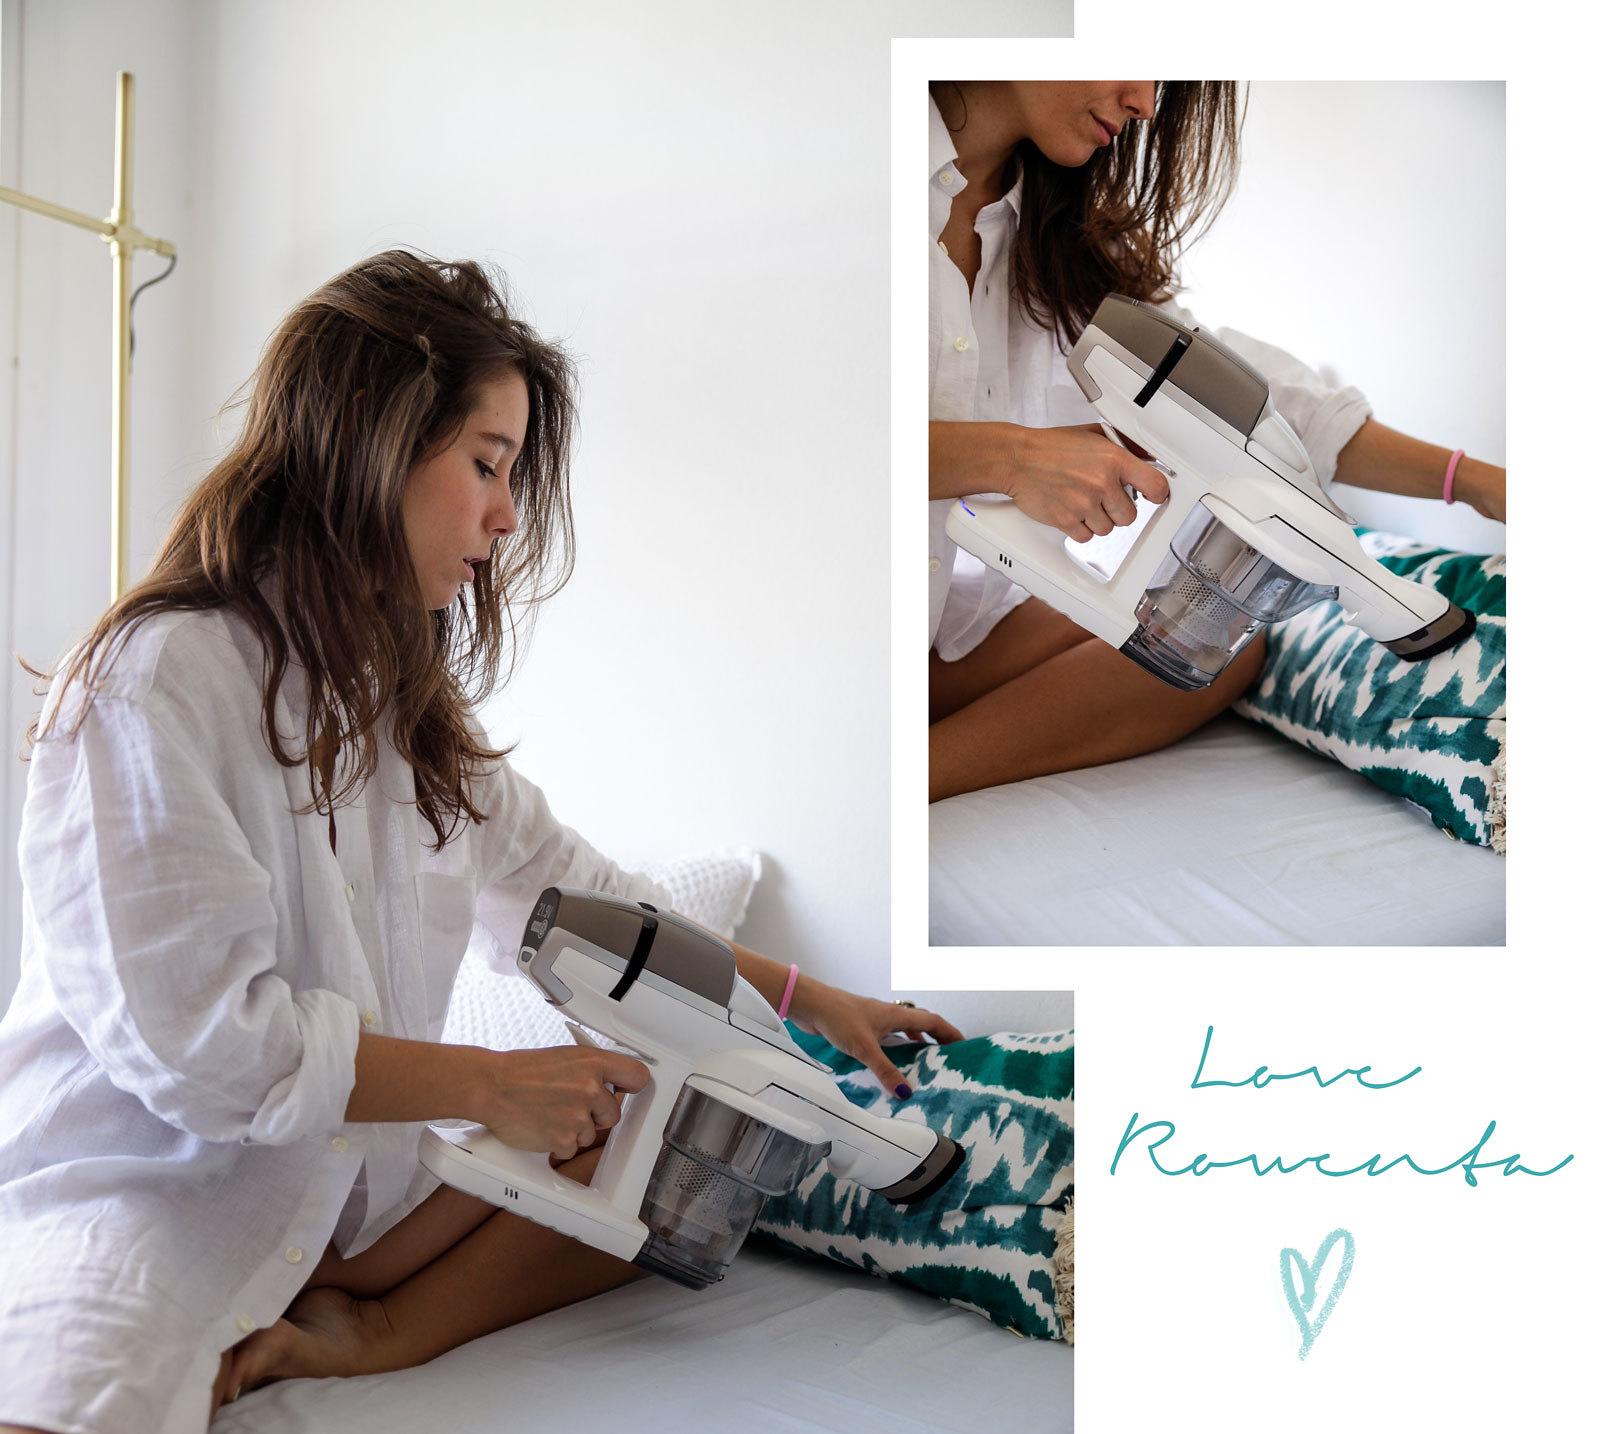 09_Rowenta_aspirador_sin_cables_nuevo_electrodomésticos_hogar_inspo_deco_influencer_house_theguestgirl